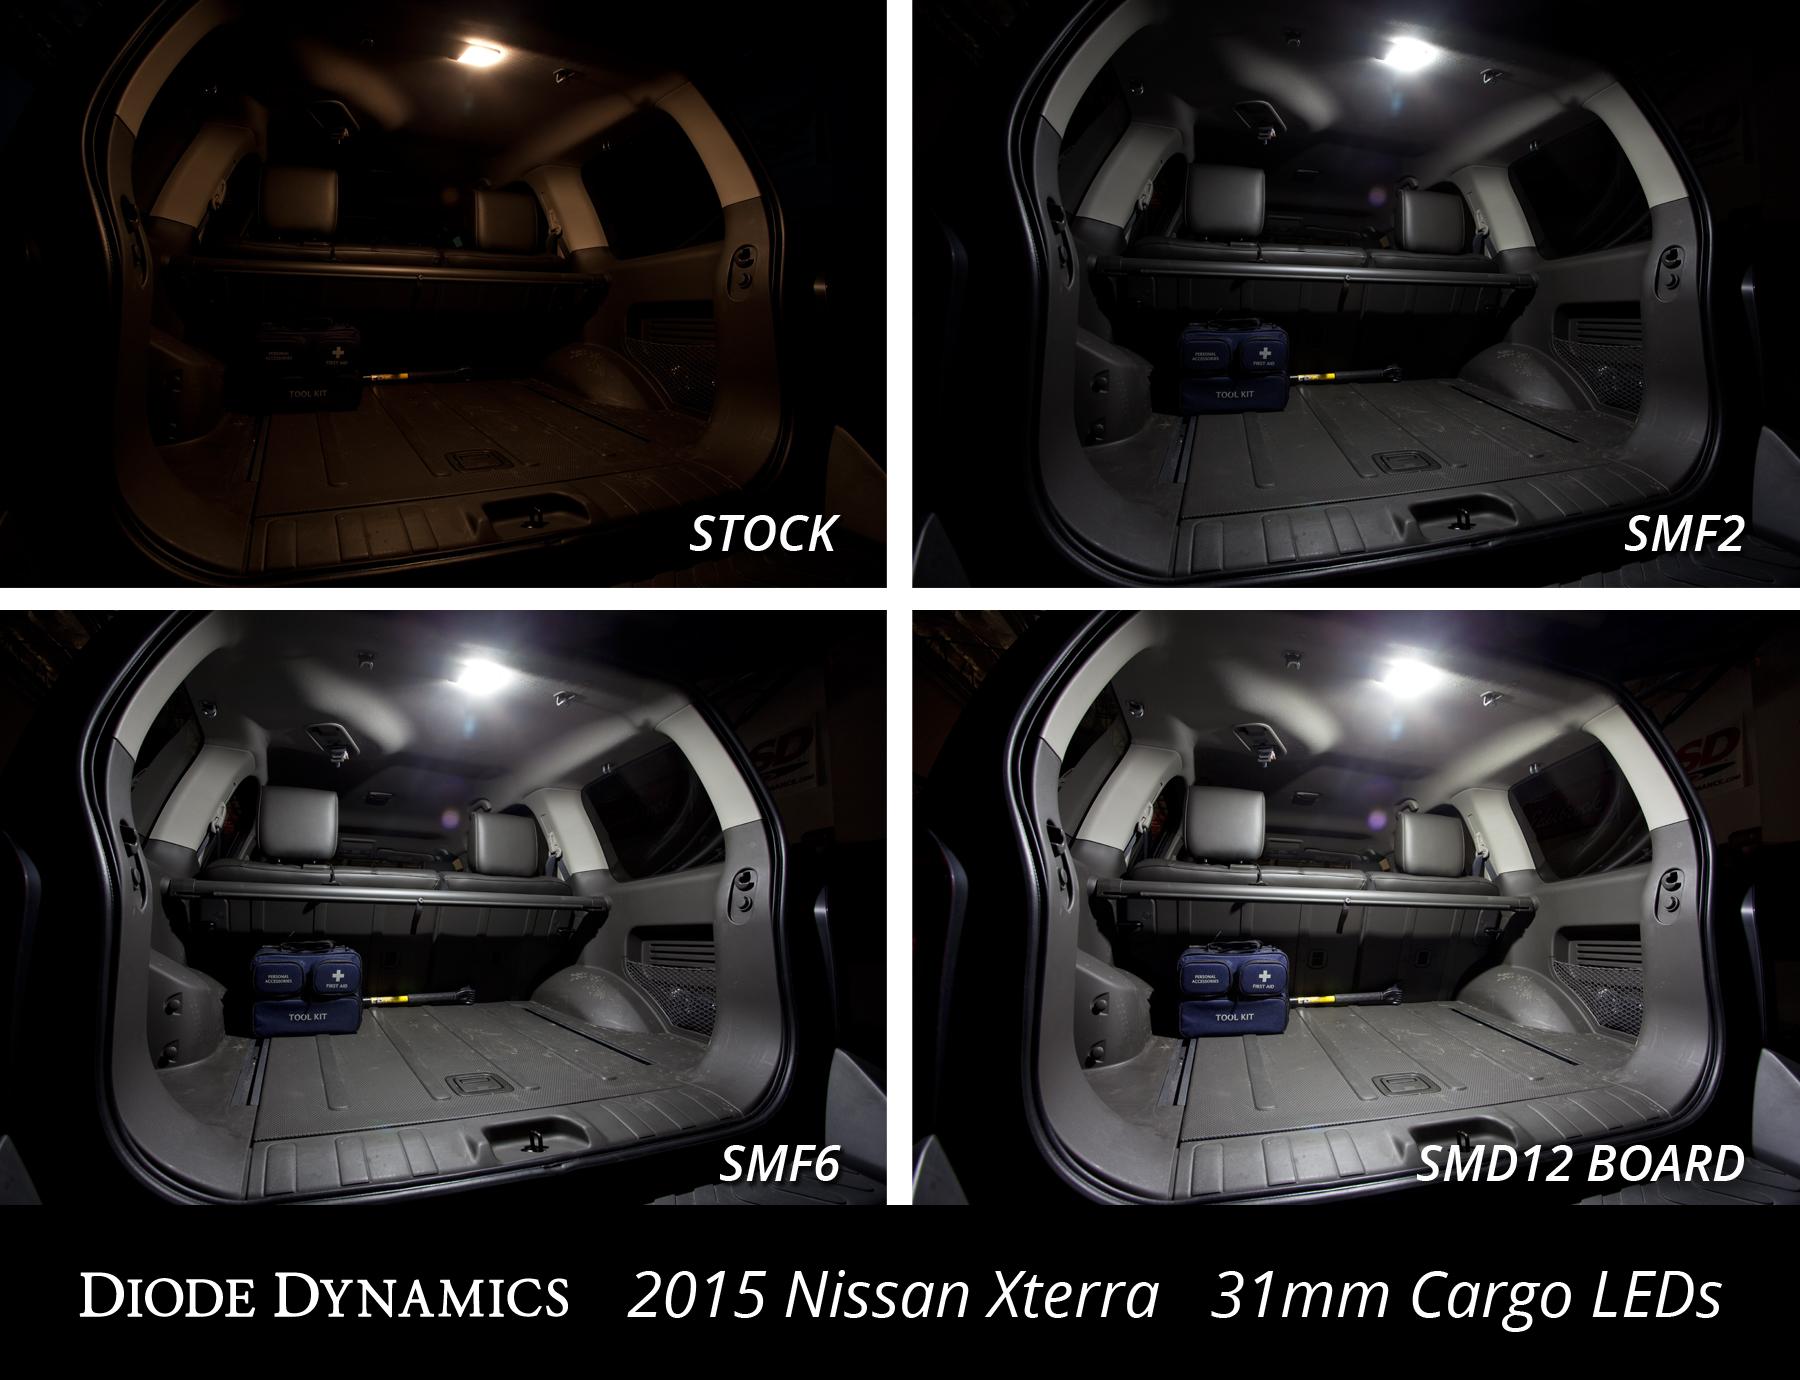 nissan xterra interior led lighting see installed comparison photos second generation nissan. Black Bedroom Furniture Sets. Home Design Ideas